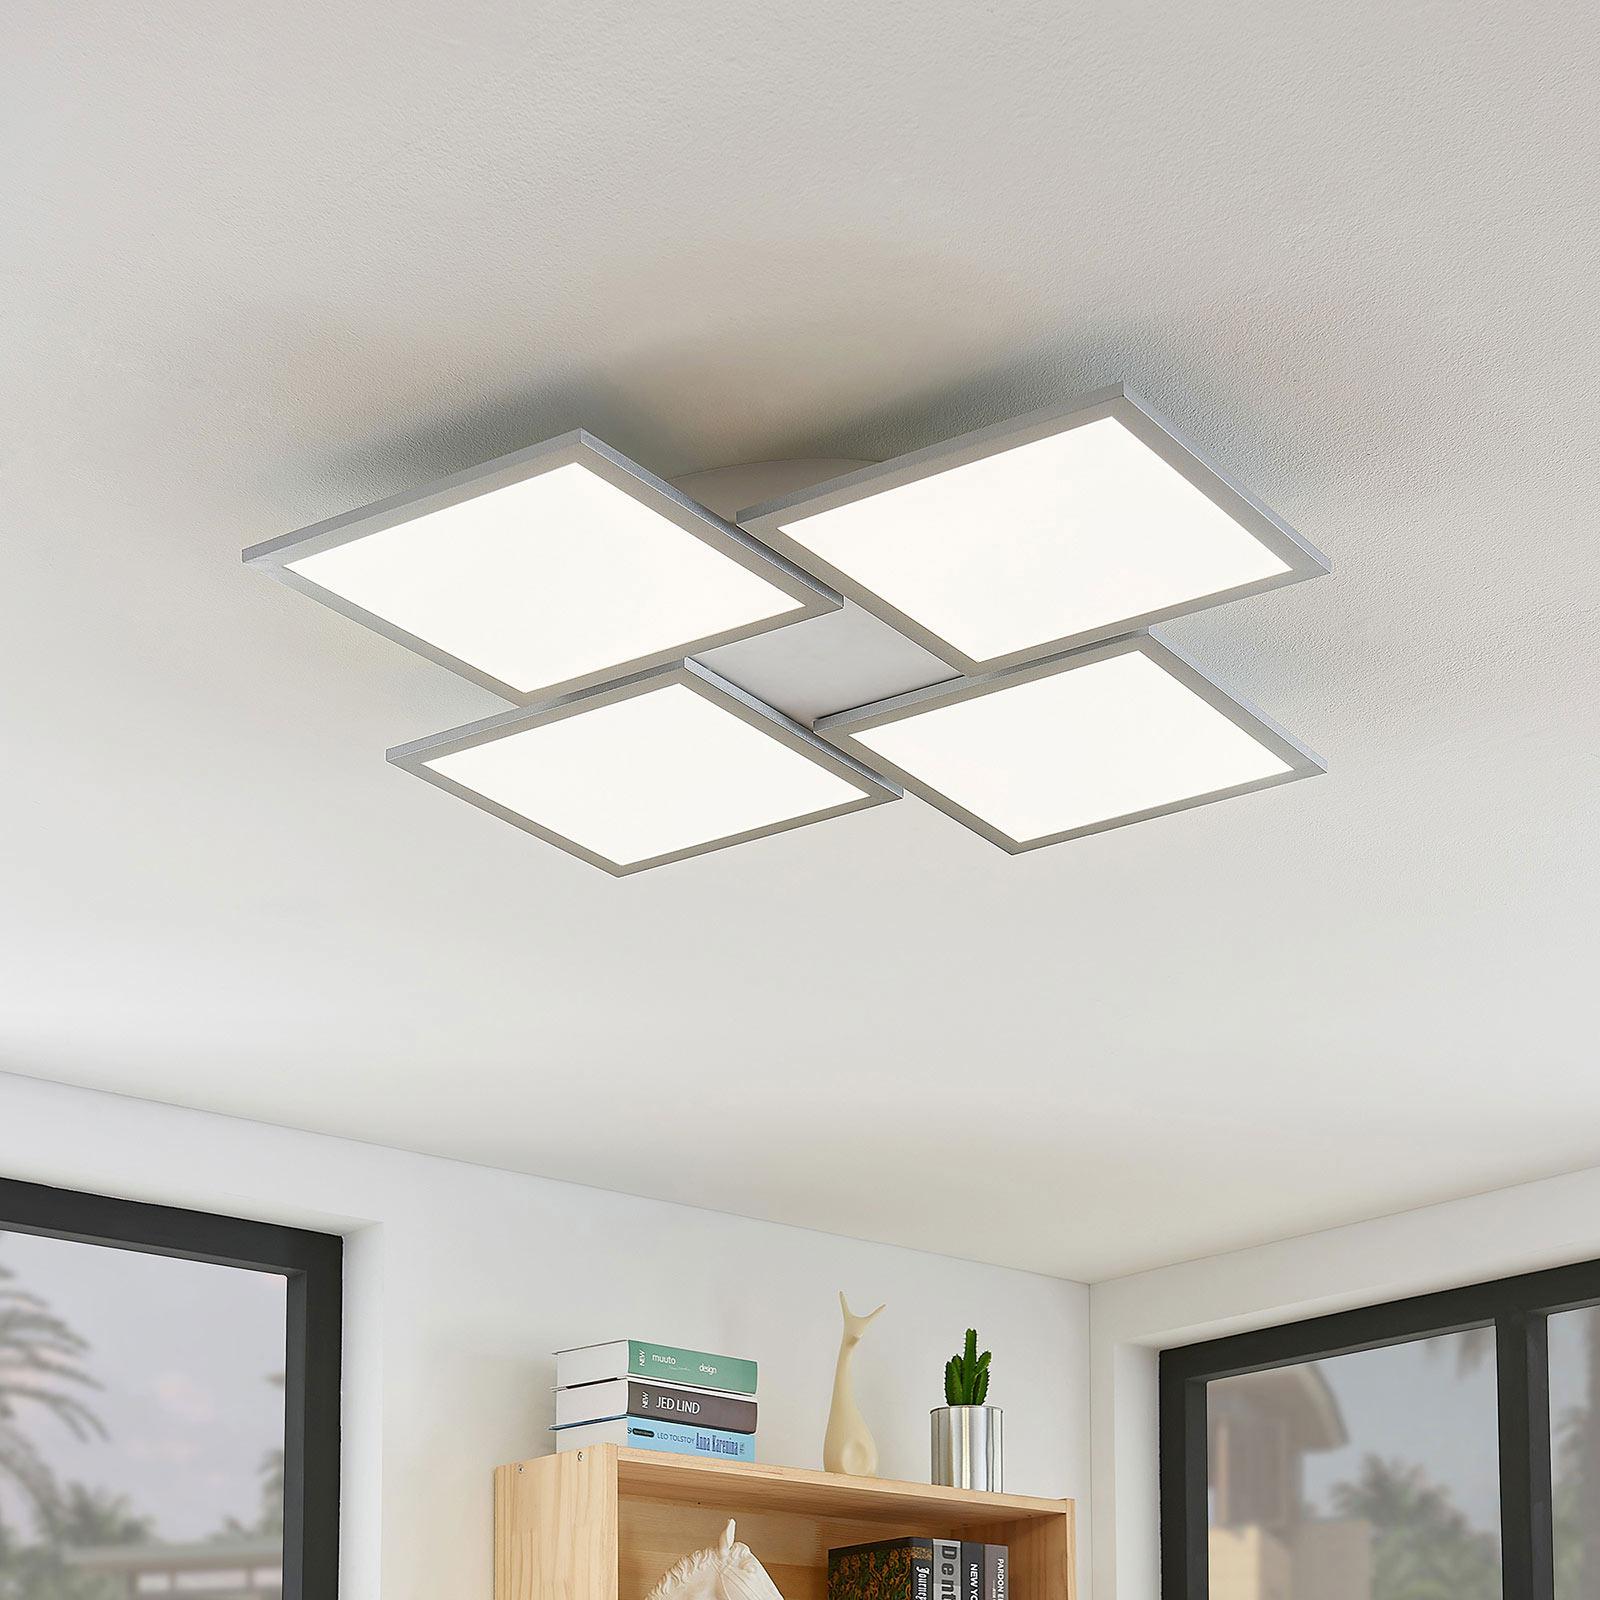 LED-taklampa Ilira, dimbar, CCT, 4 lampor